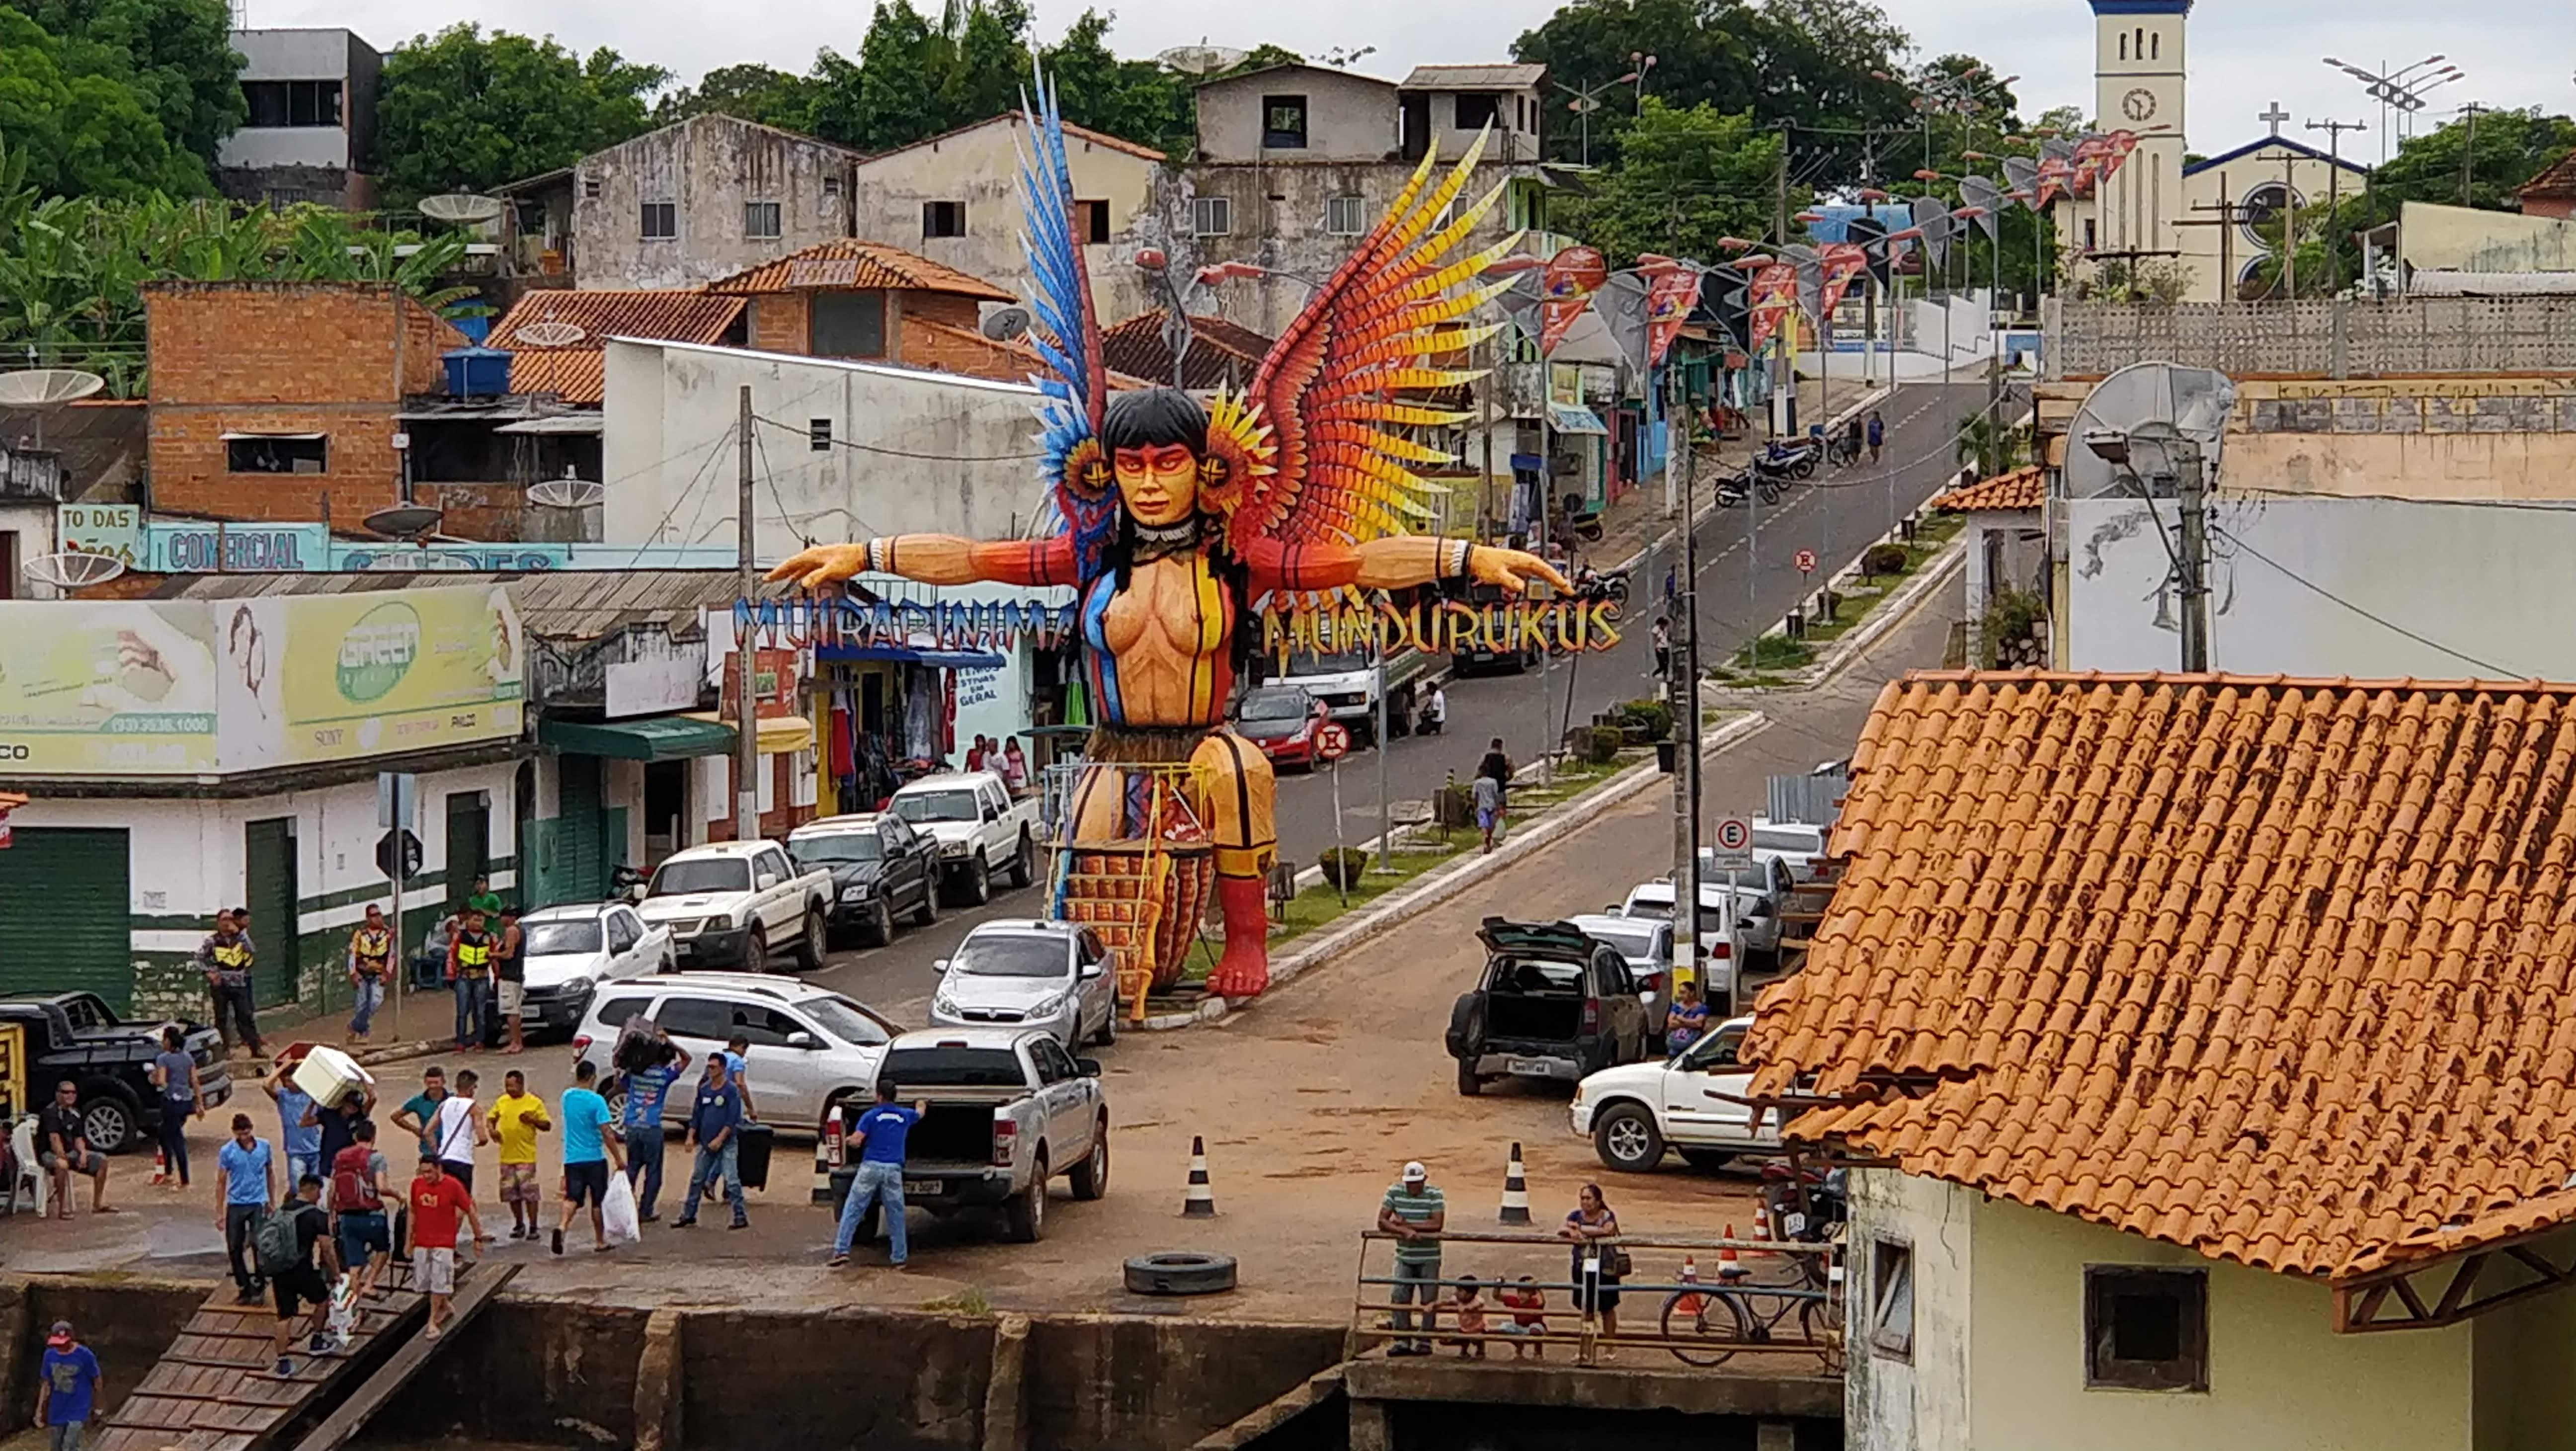 Juruti Pará fonte: upload.wikimedia.org